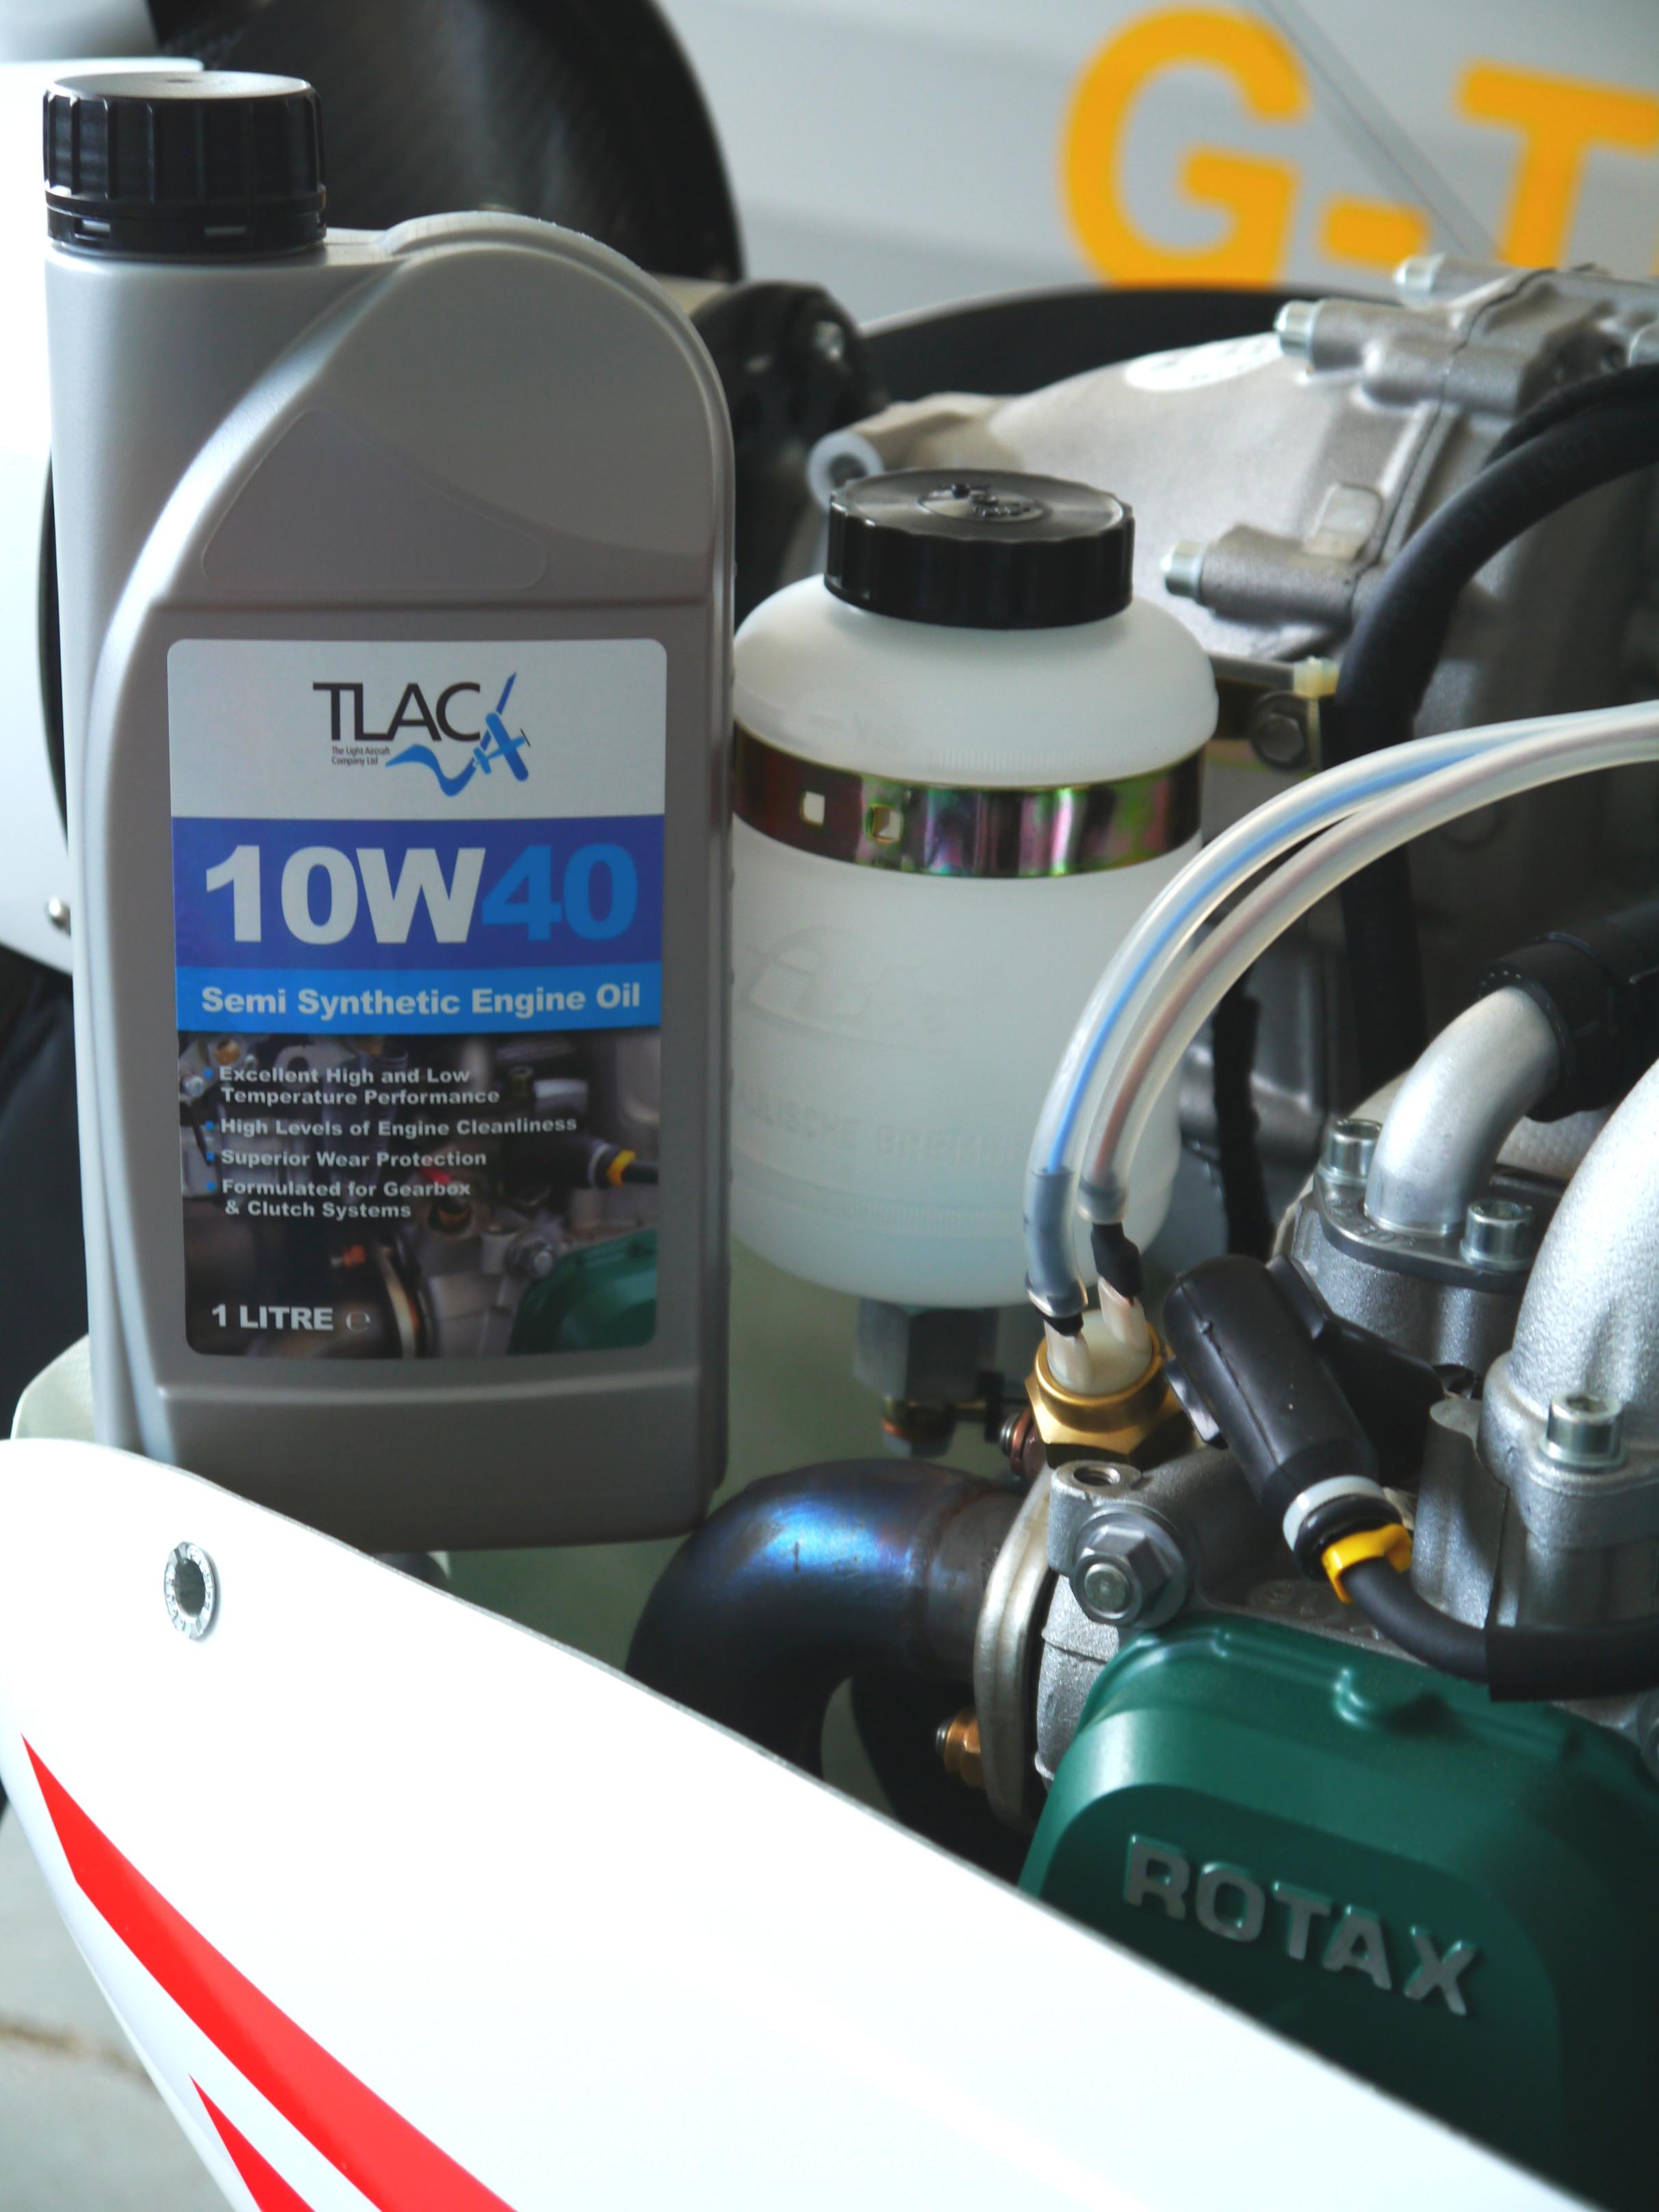 Aero Plus 10W40 engine oil x 12